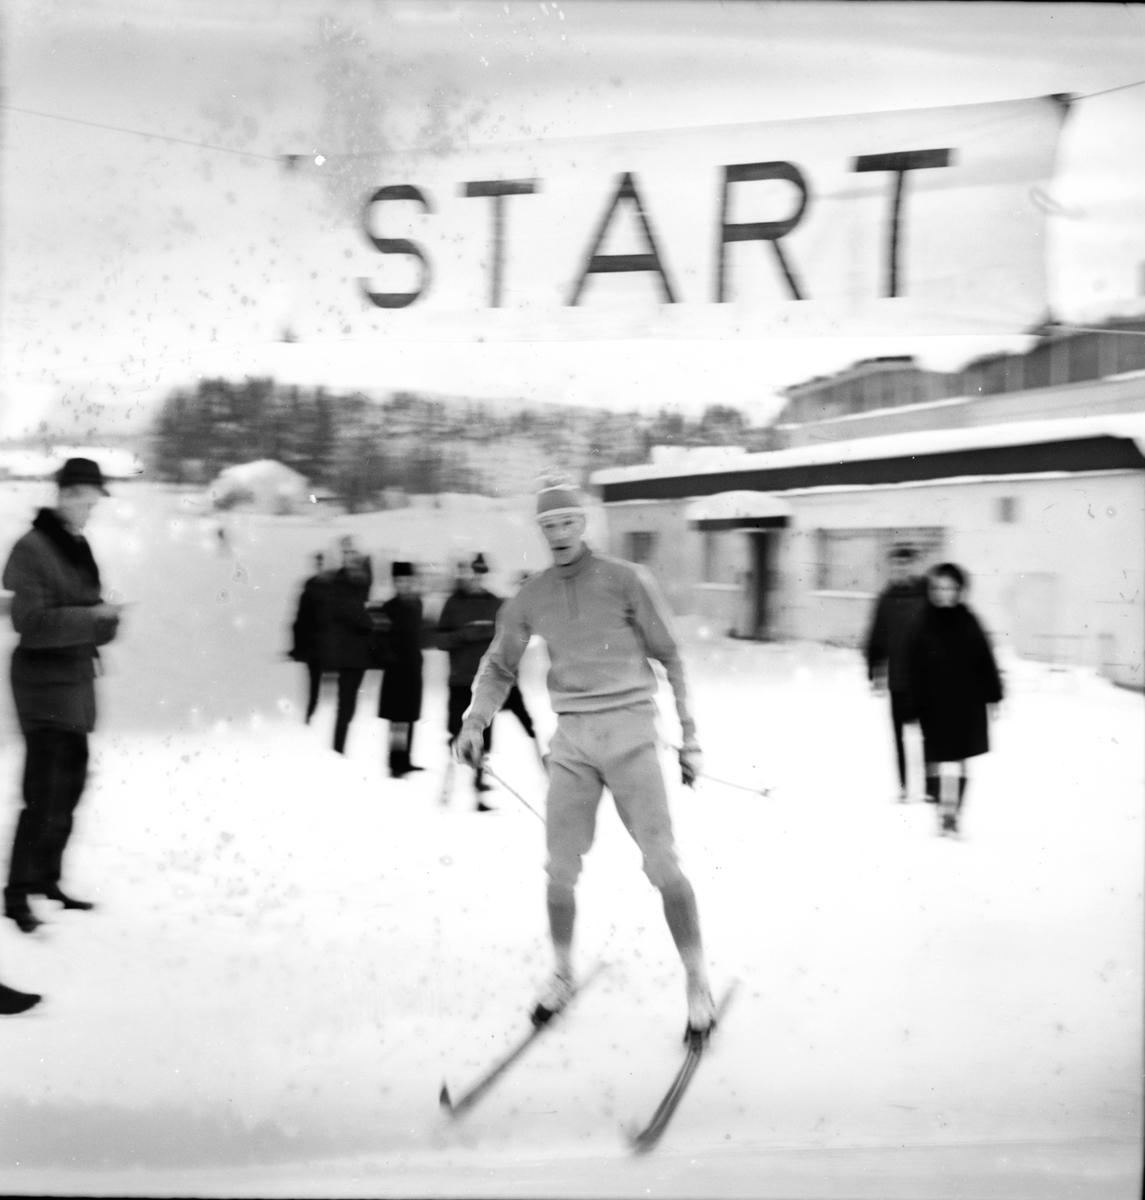 Arbrå, TV-loppet 1969, Trettondan, Conny Bodén, Oscar Segelberg, G. Fröderberg